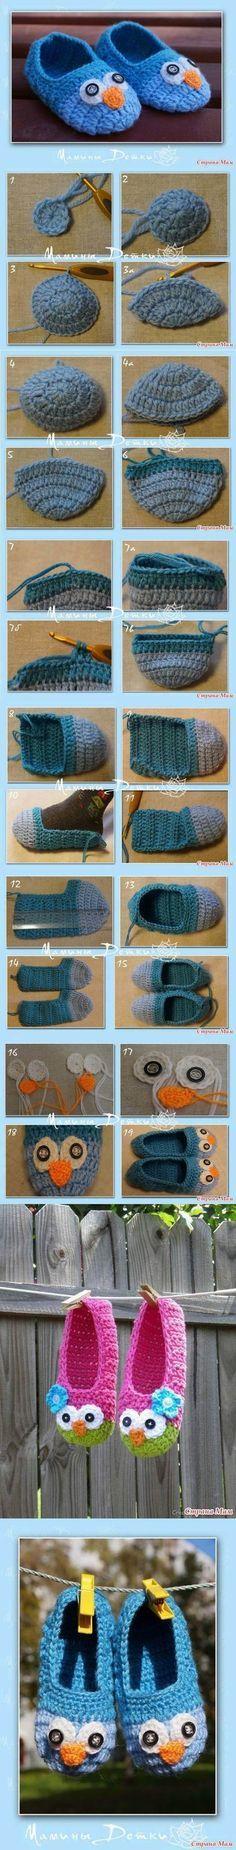 DIY Cute Crochet Owl Slippers for Kids | iCreativeIdeas.com Like Us on Facebook ==> https://www.facebook.com/icreativeideas